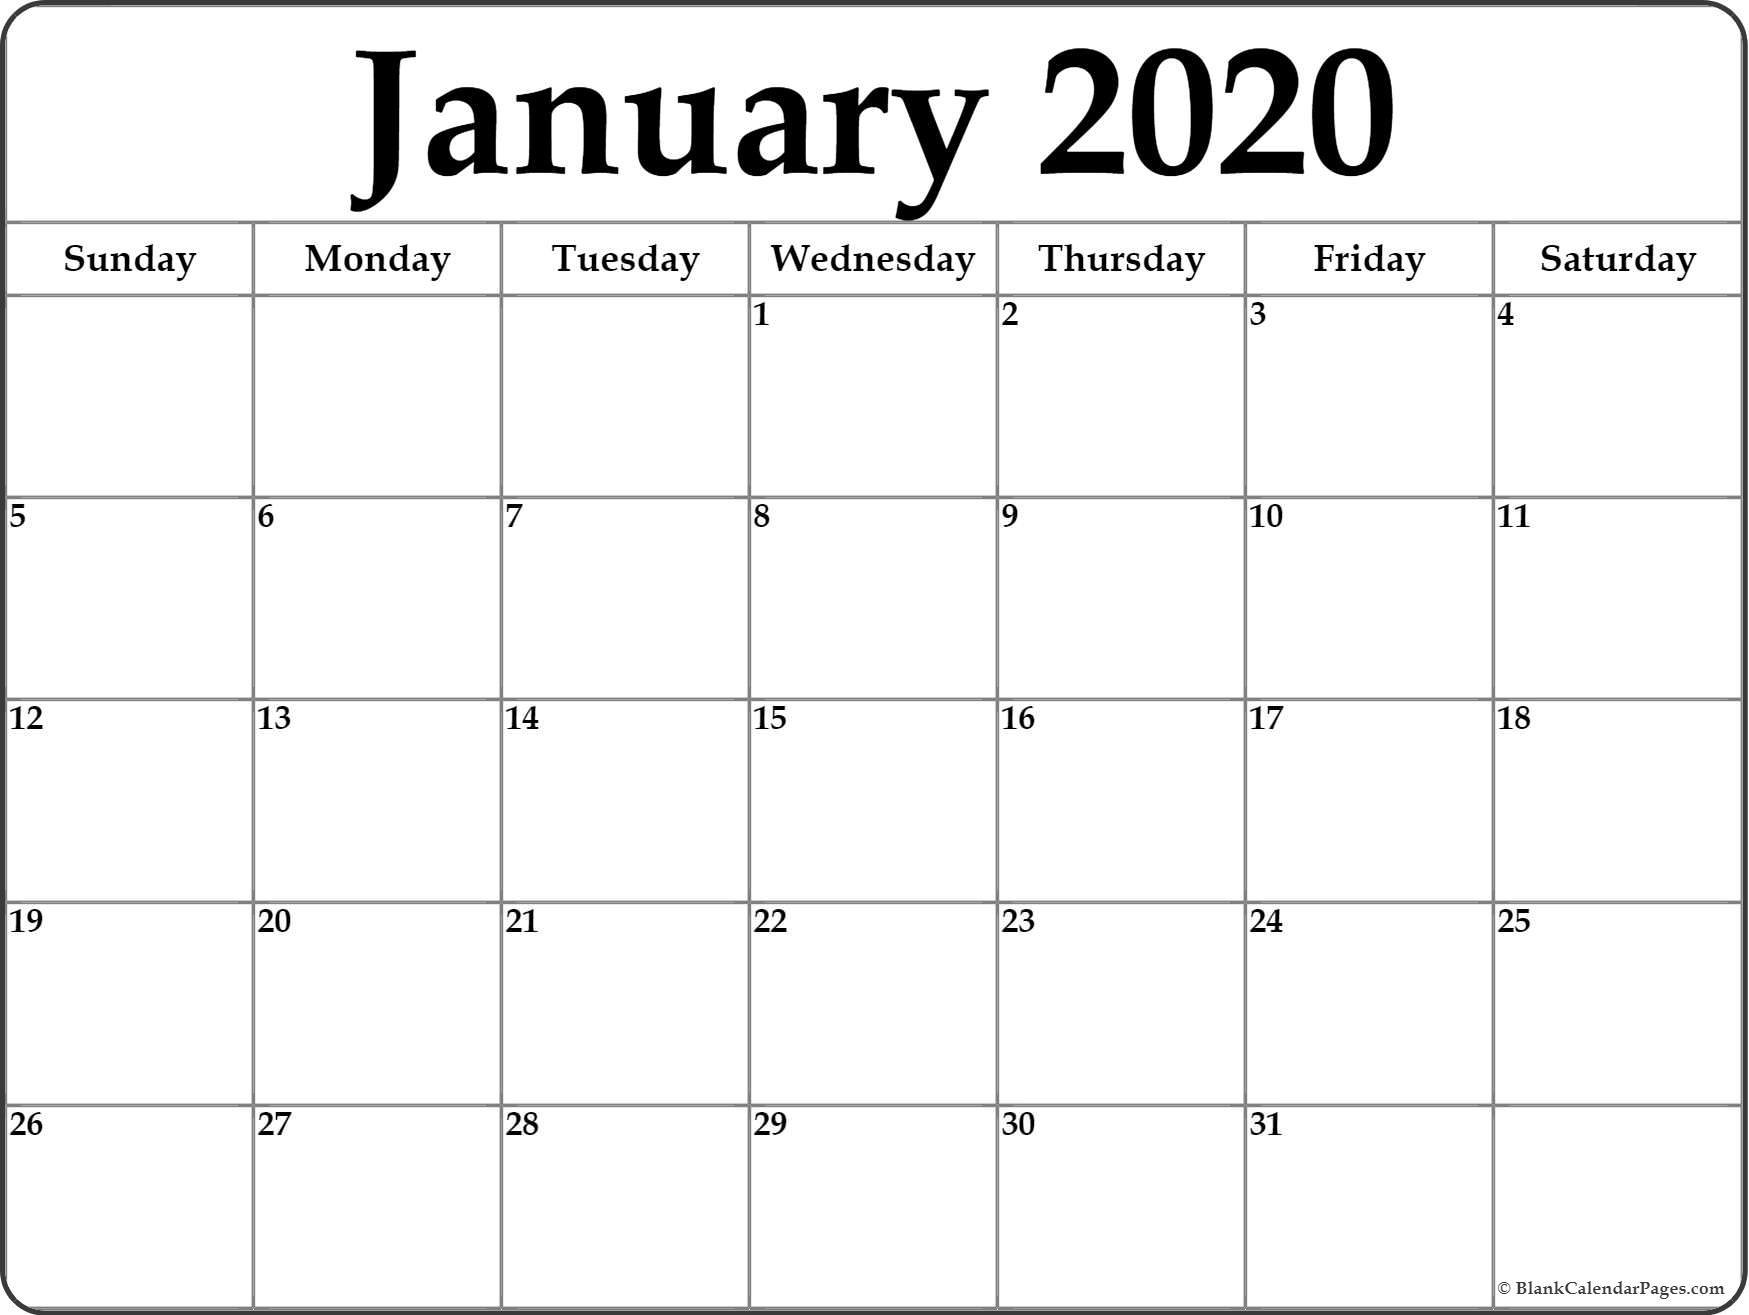 January 2020 Calendar | Free Printable Monthly Calendars-Printable Monthly Calendar 2020